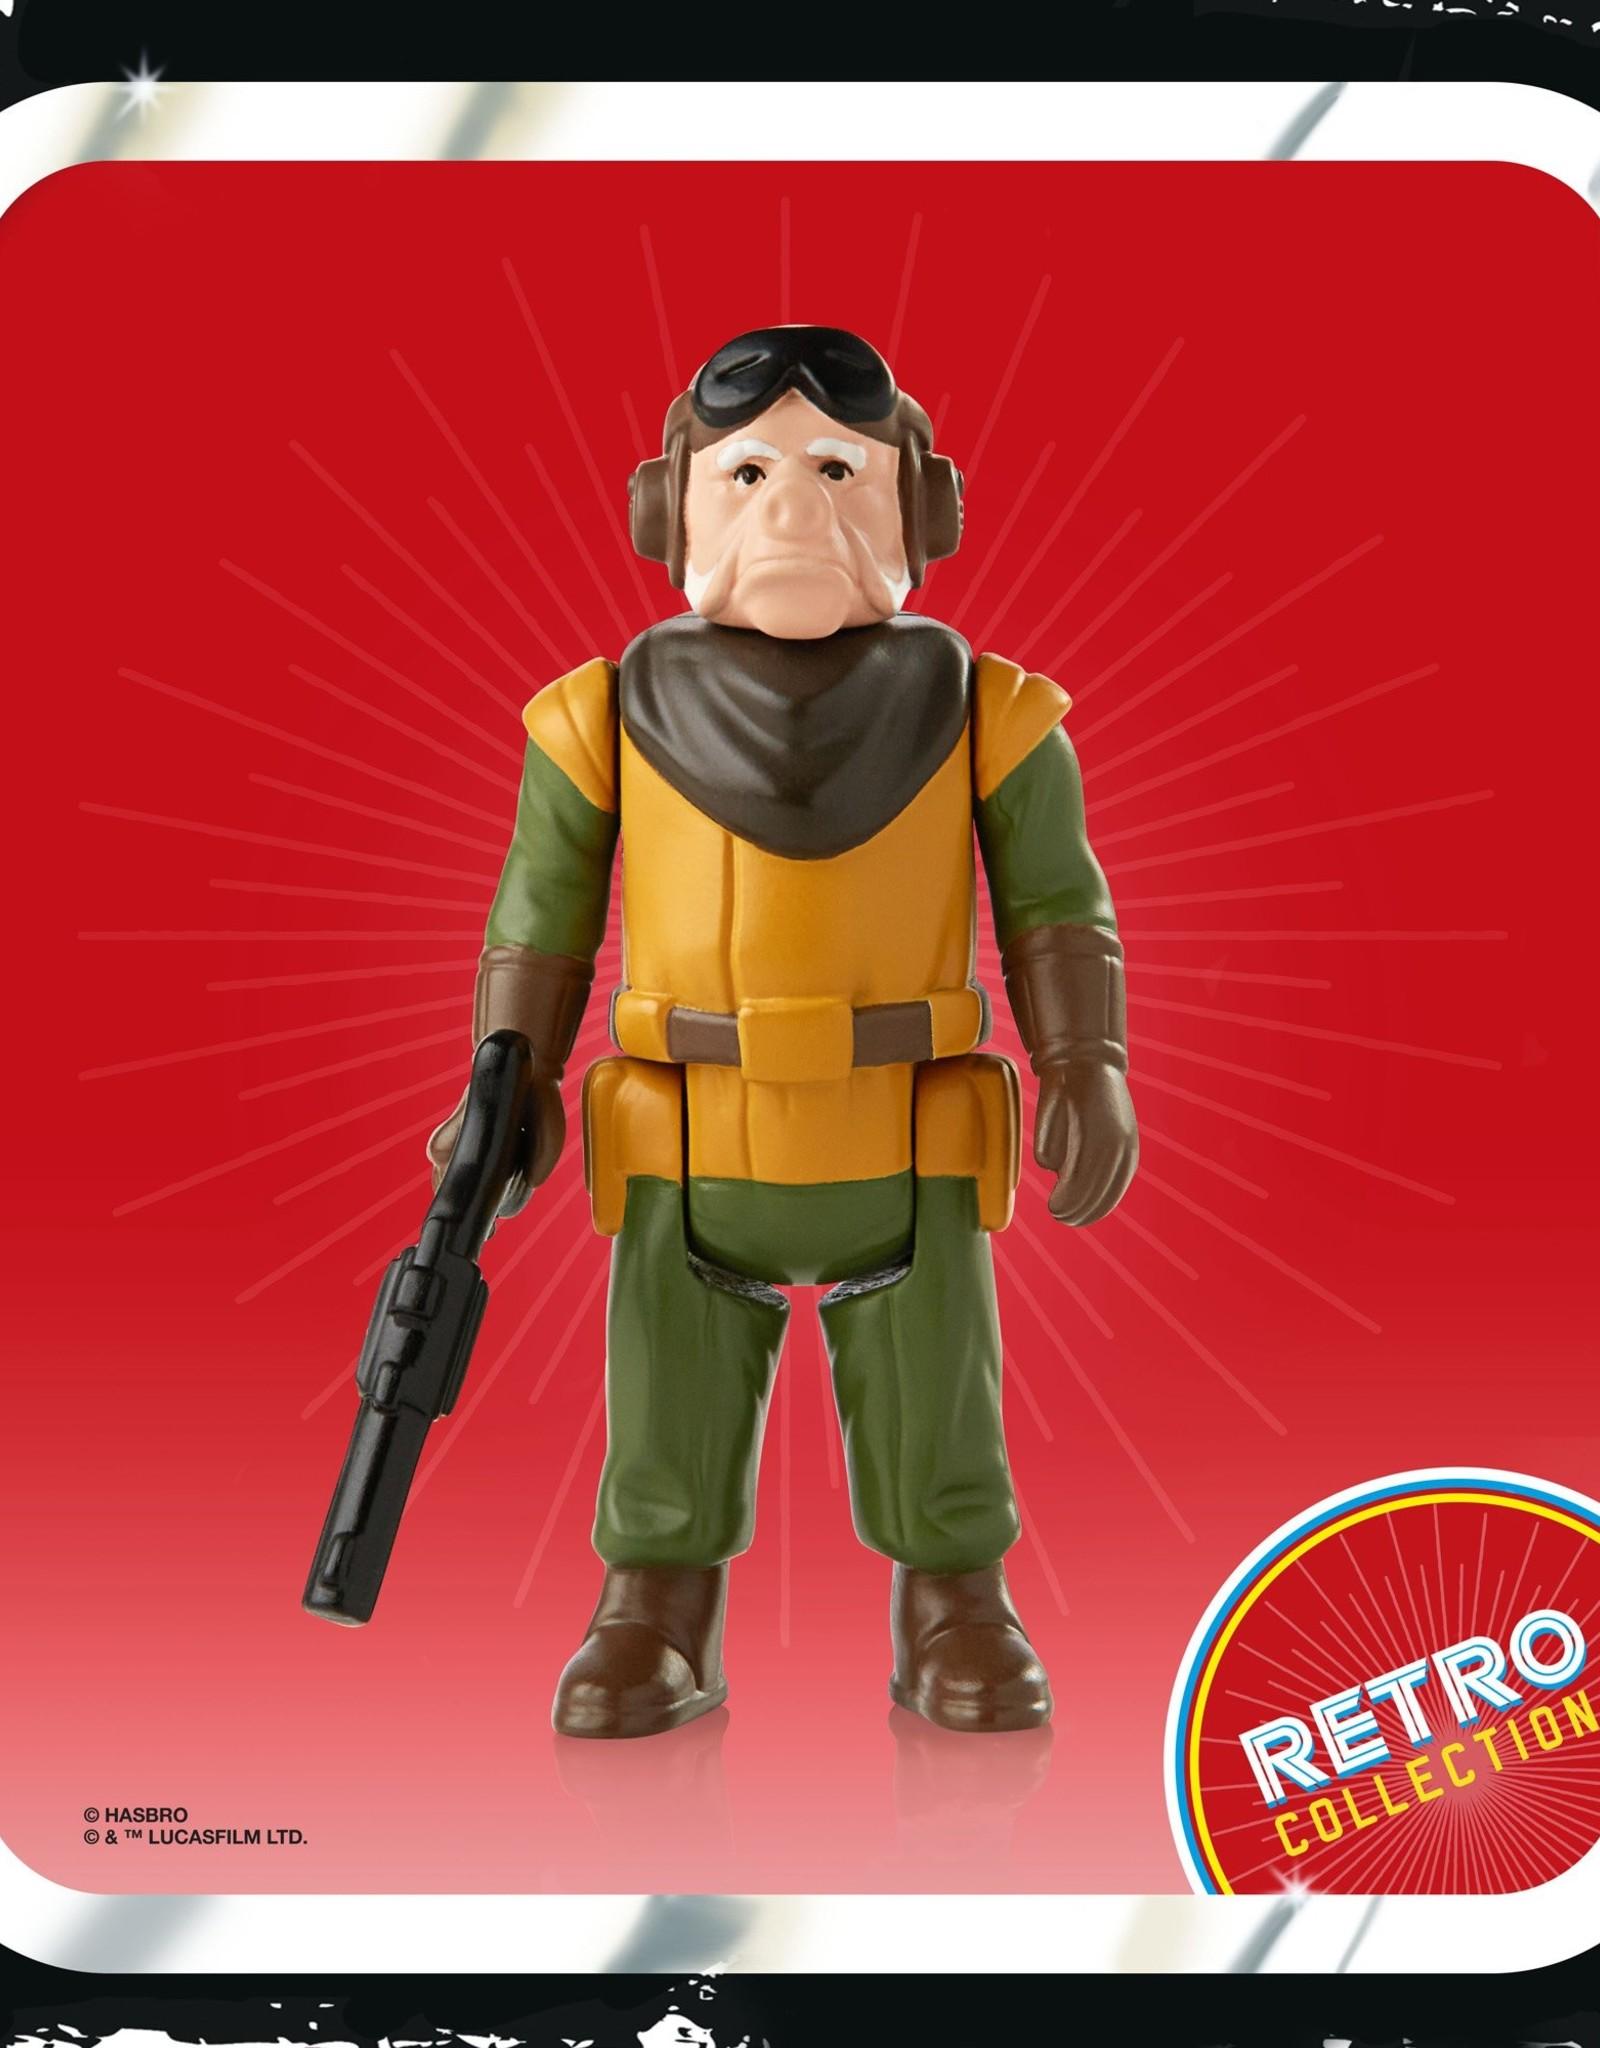 HASBRO Star Wars - The Retro Collection 3 3/4 in scale: Kuiil (The Mandalorian)